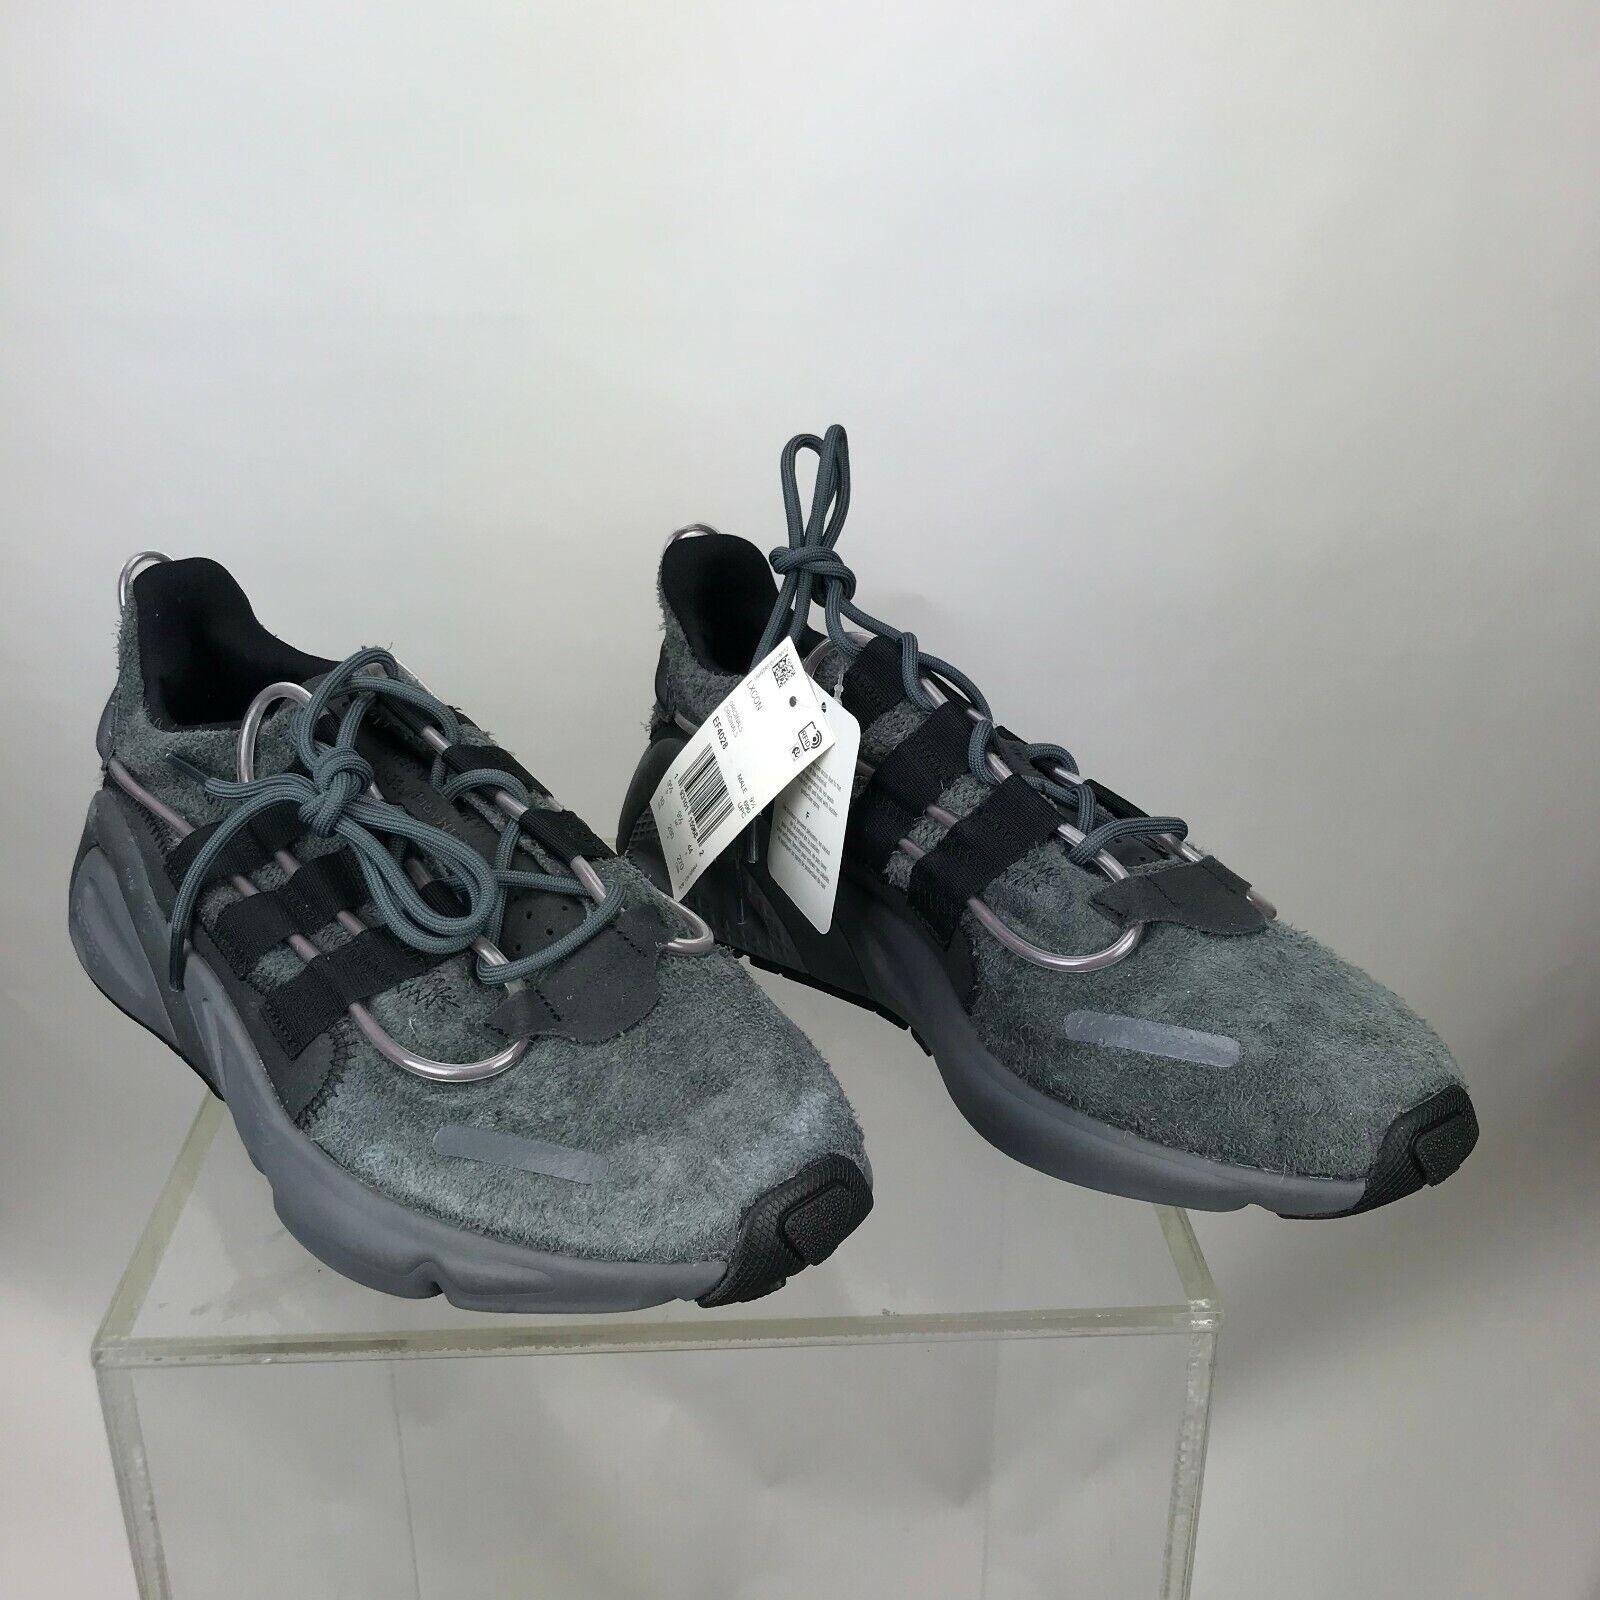 Adidas Originals LXCON Grey Men Lifestyle New Shoes running